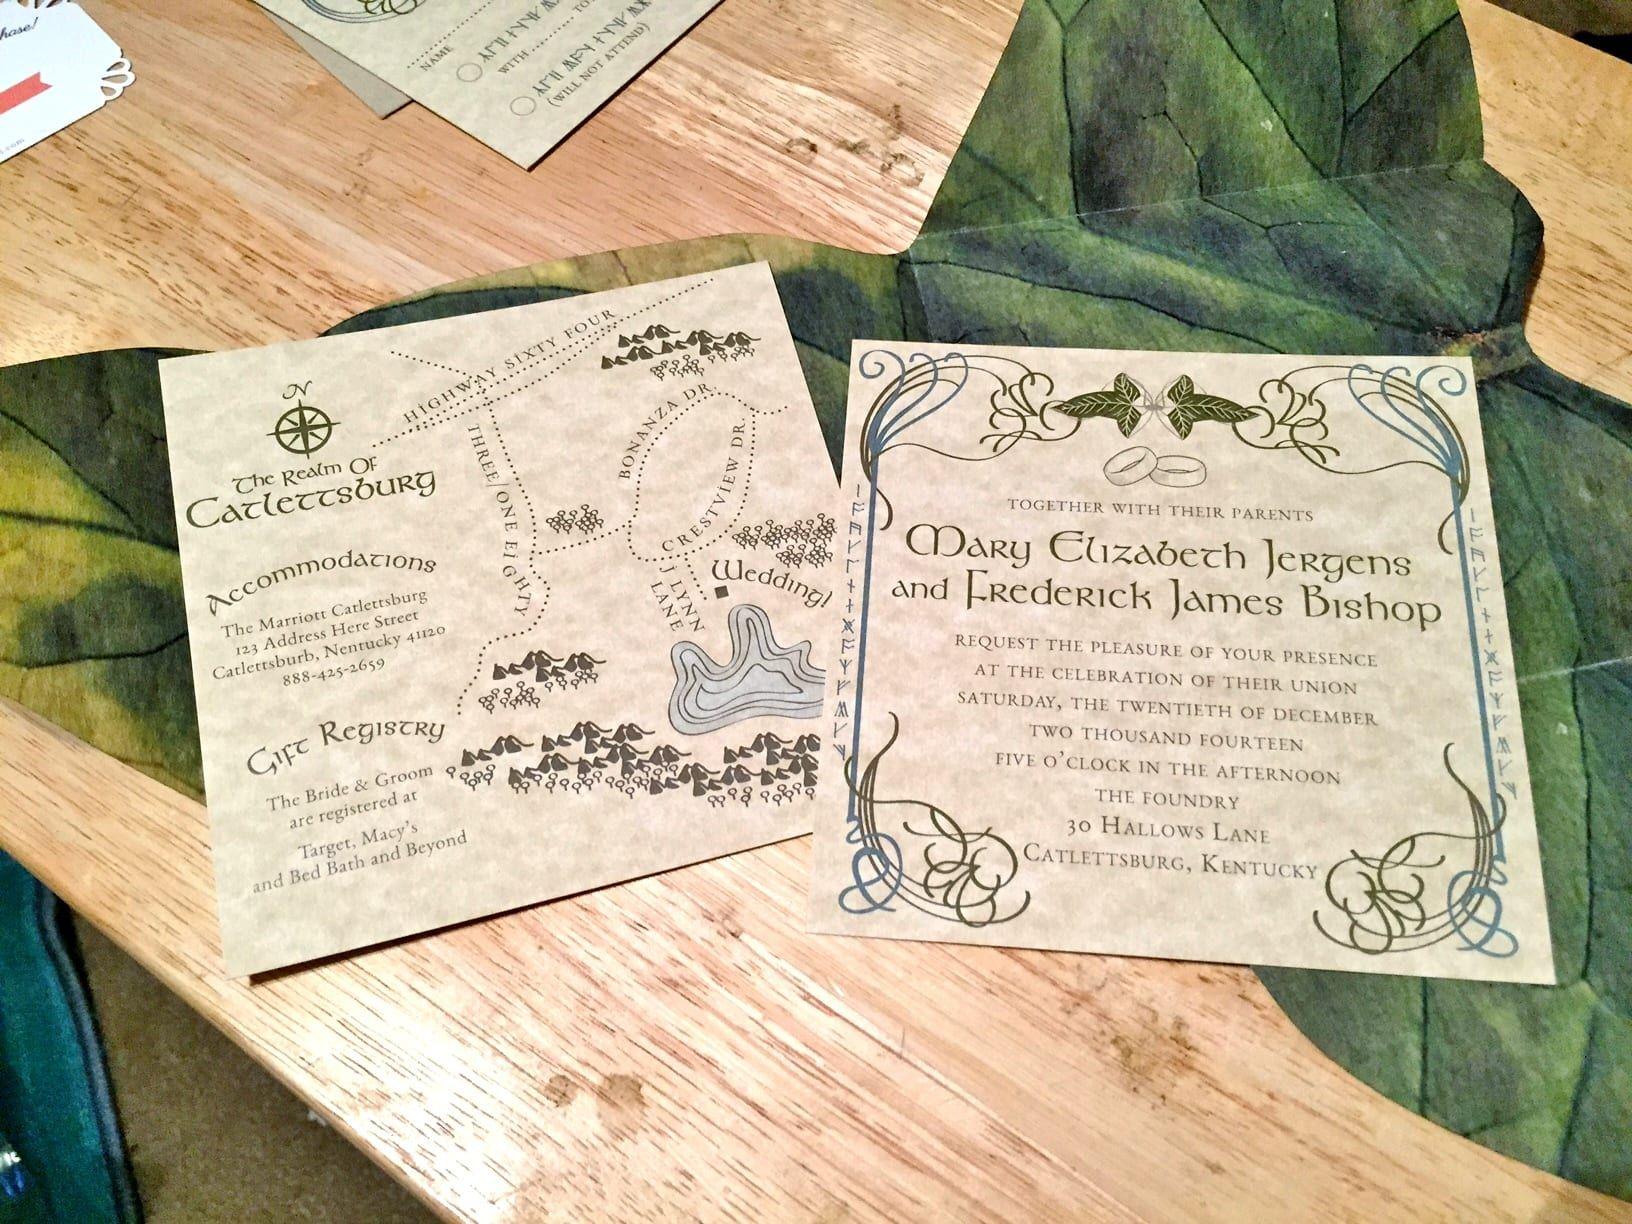 Izyaschnye Wedding Rings Wedding Invitation Lord Of The Rings